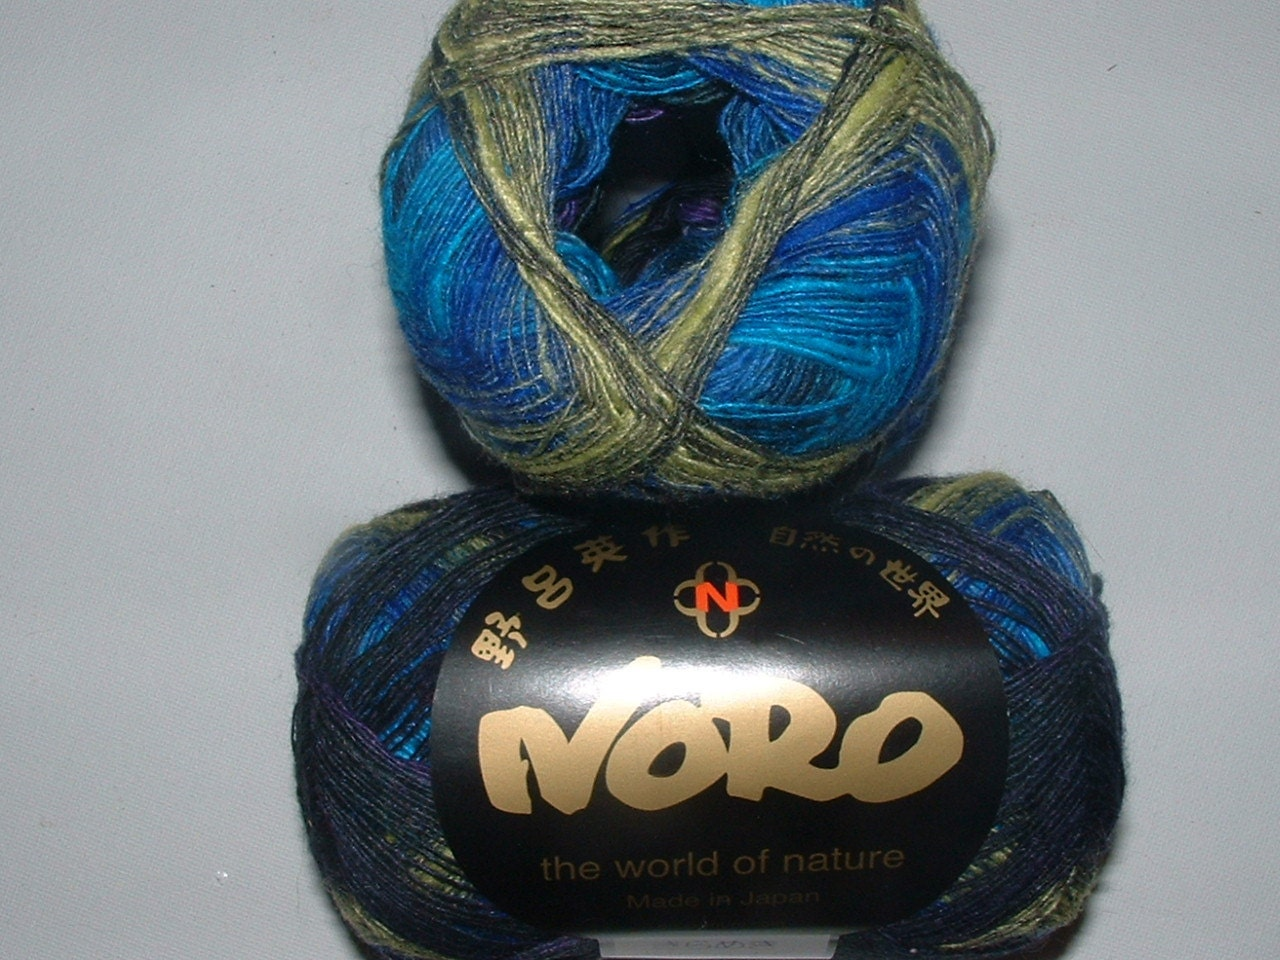 Noro Kirameki Blues 450m/skein